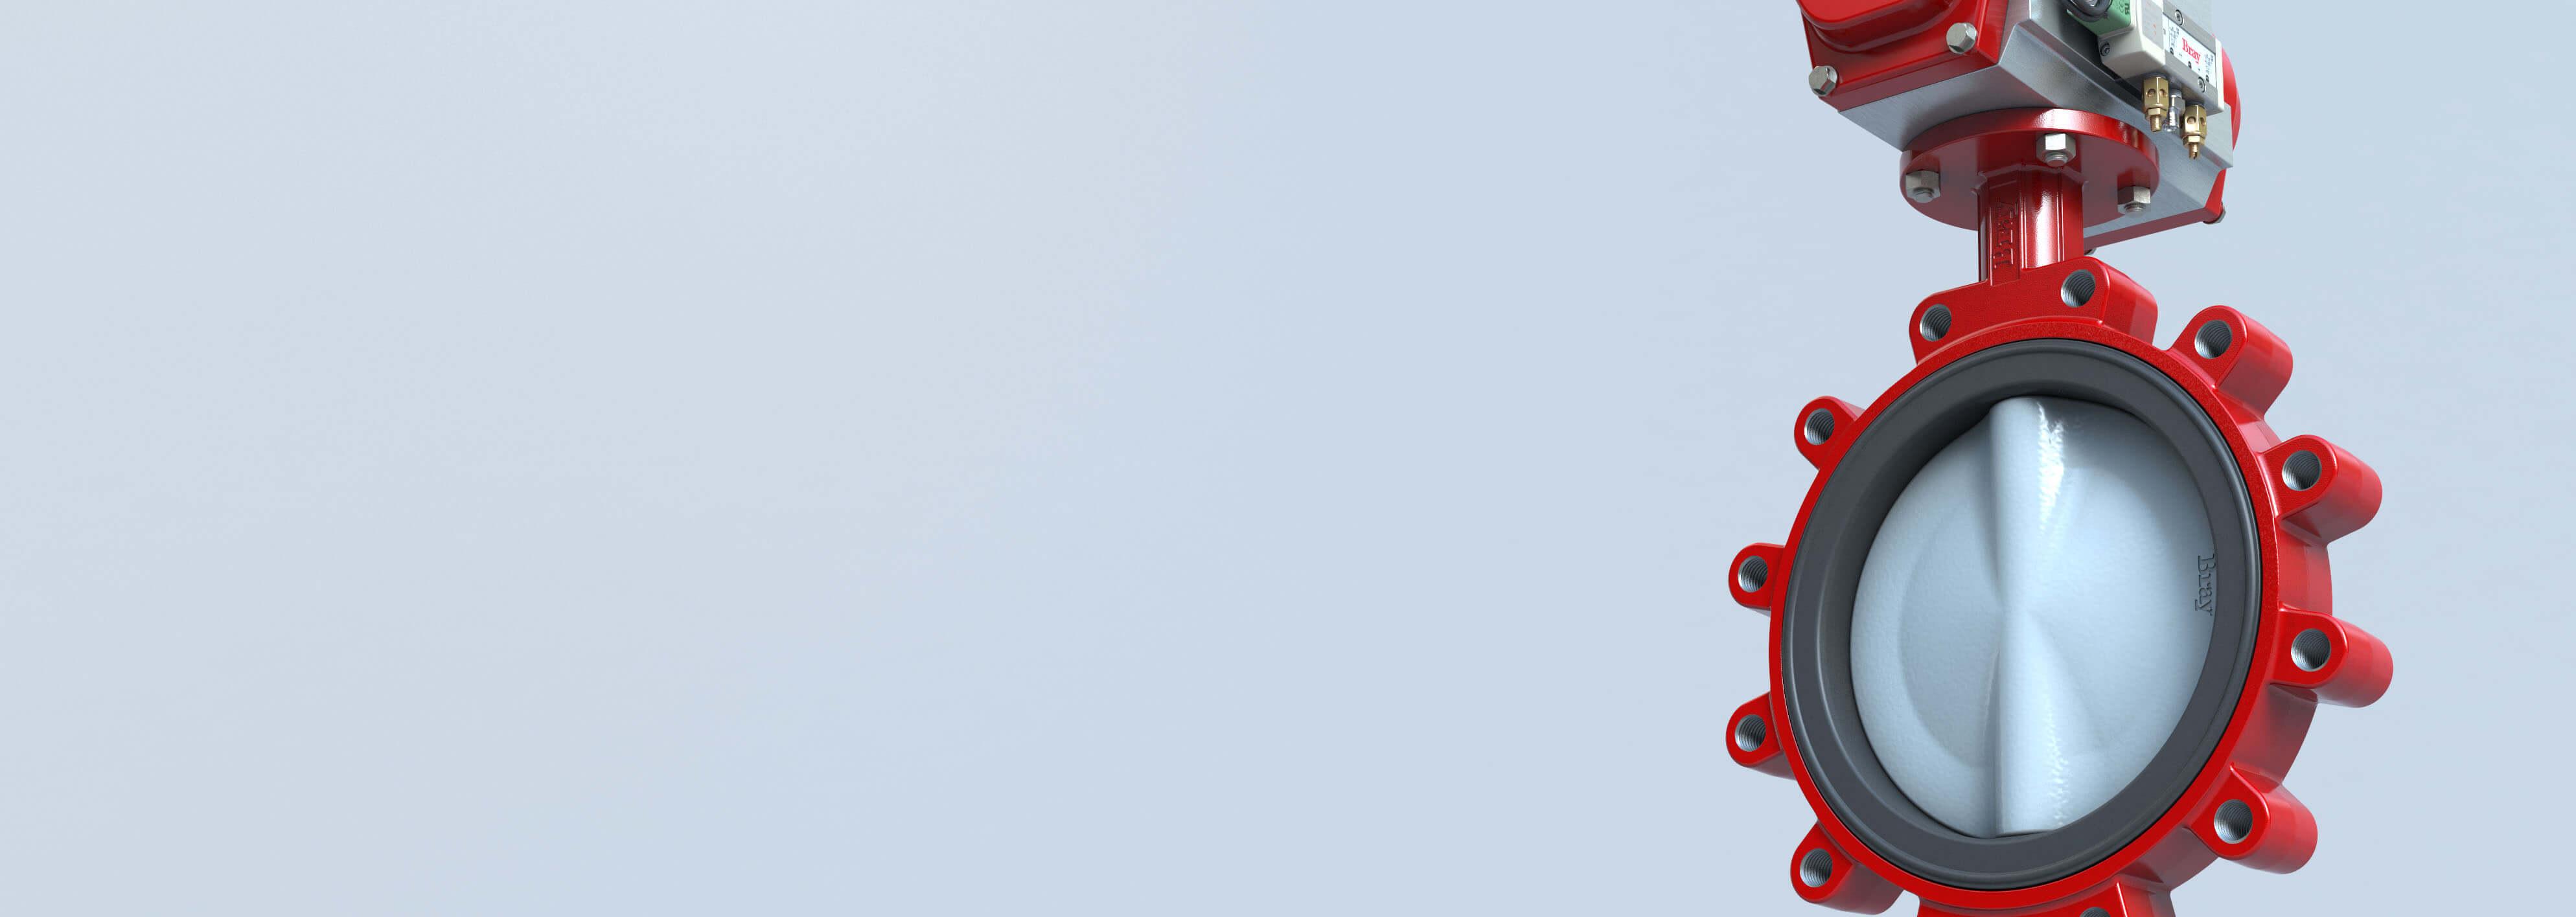 Vanne papillon à siège élastomère Séries 30-31Bray International